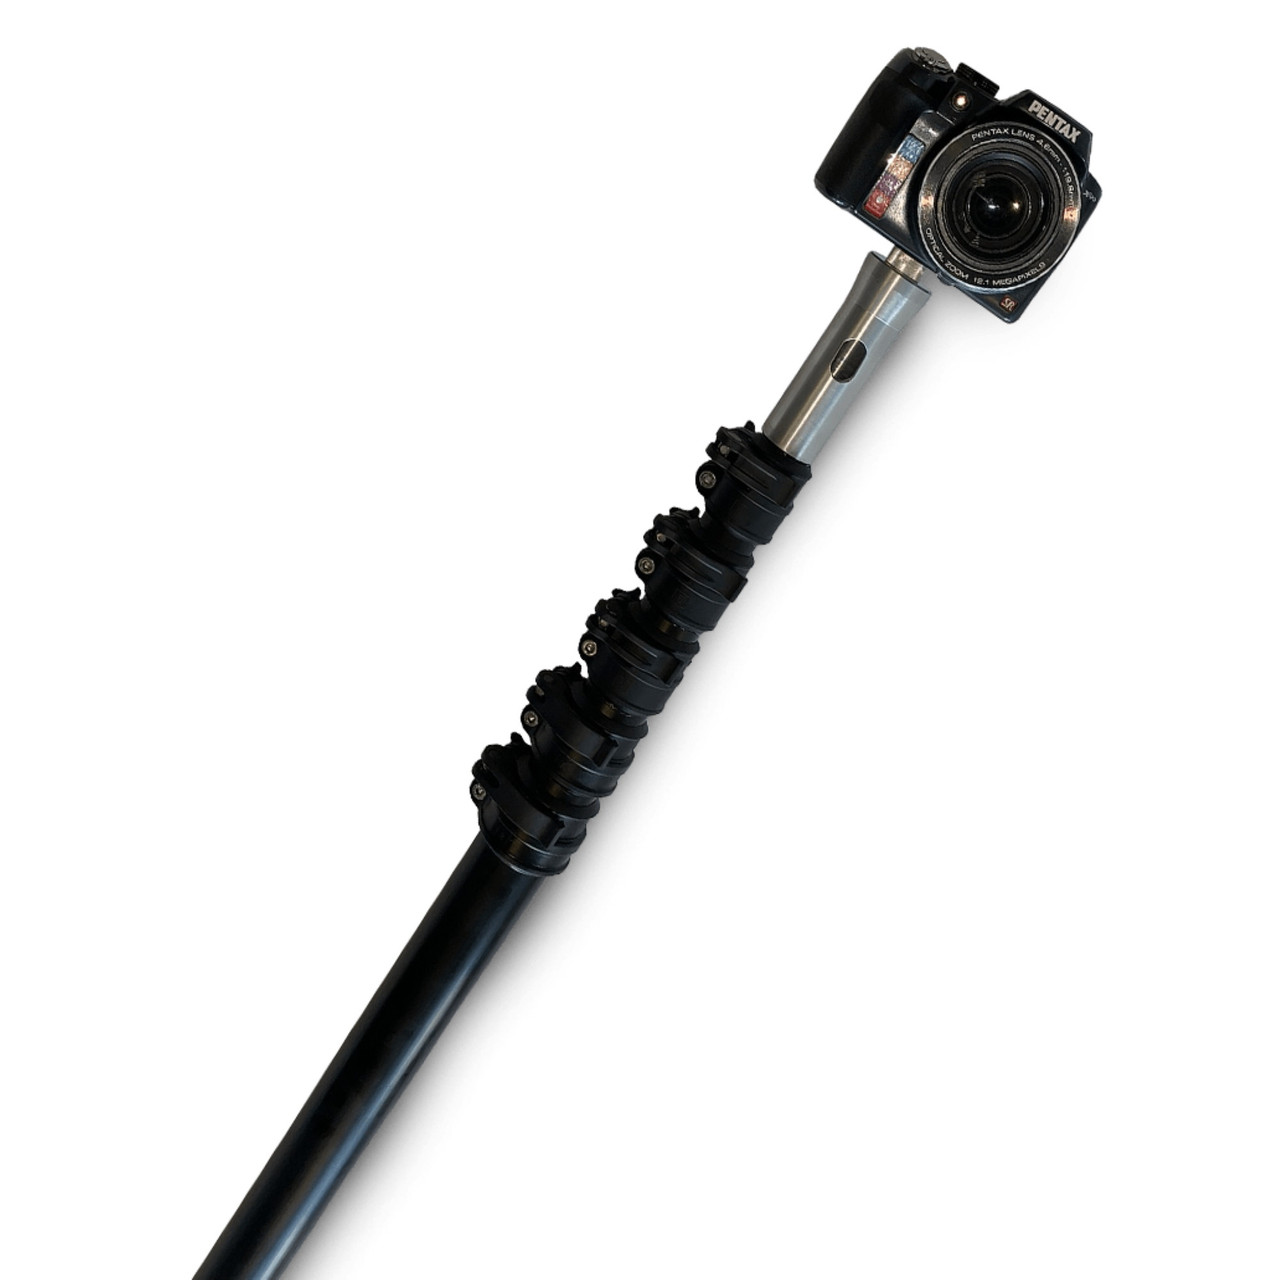 21 ft / 6.4 meter reach aluminium monopod telescopic camera pole